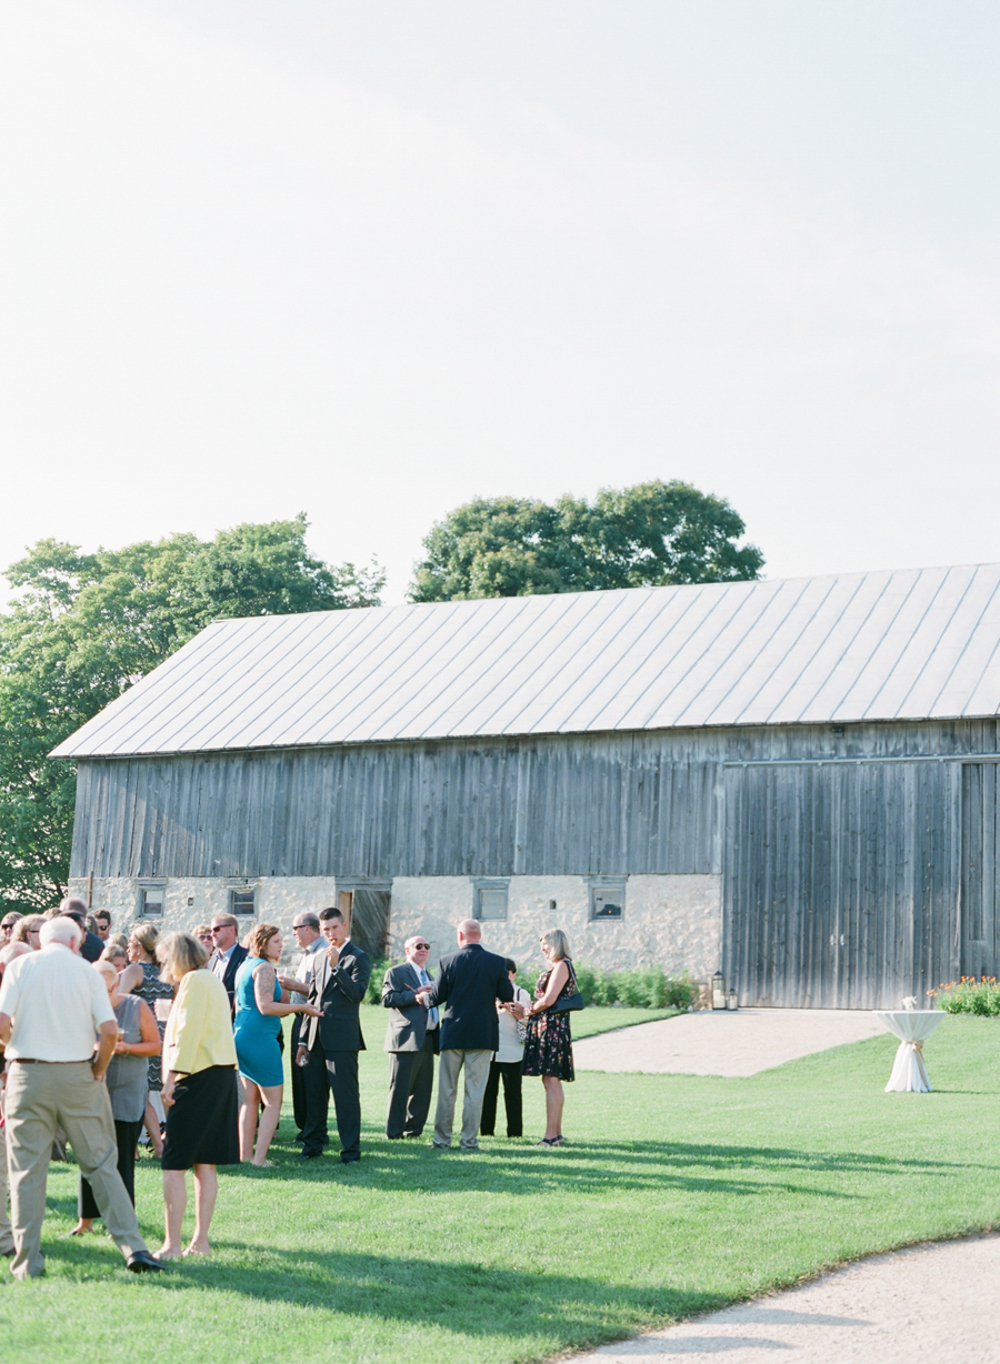 About_Thyme_Farm_Door_County_Wedding_041.jpg